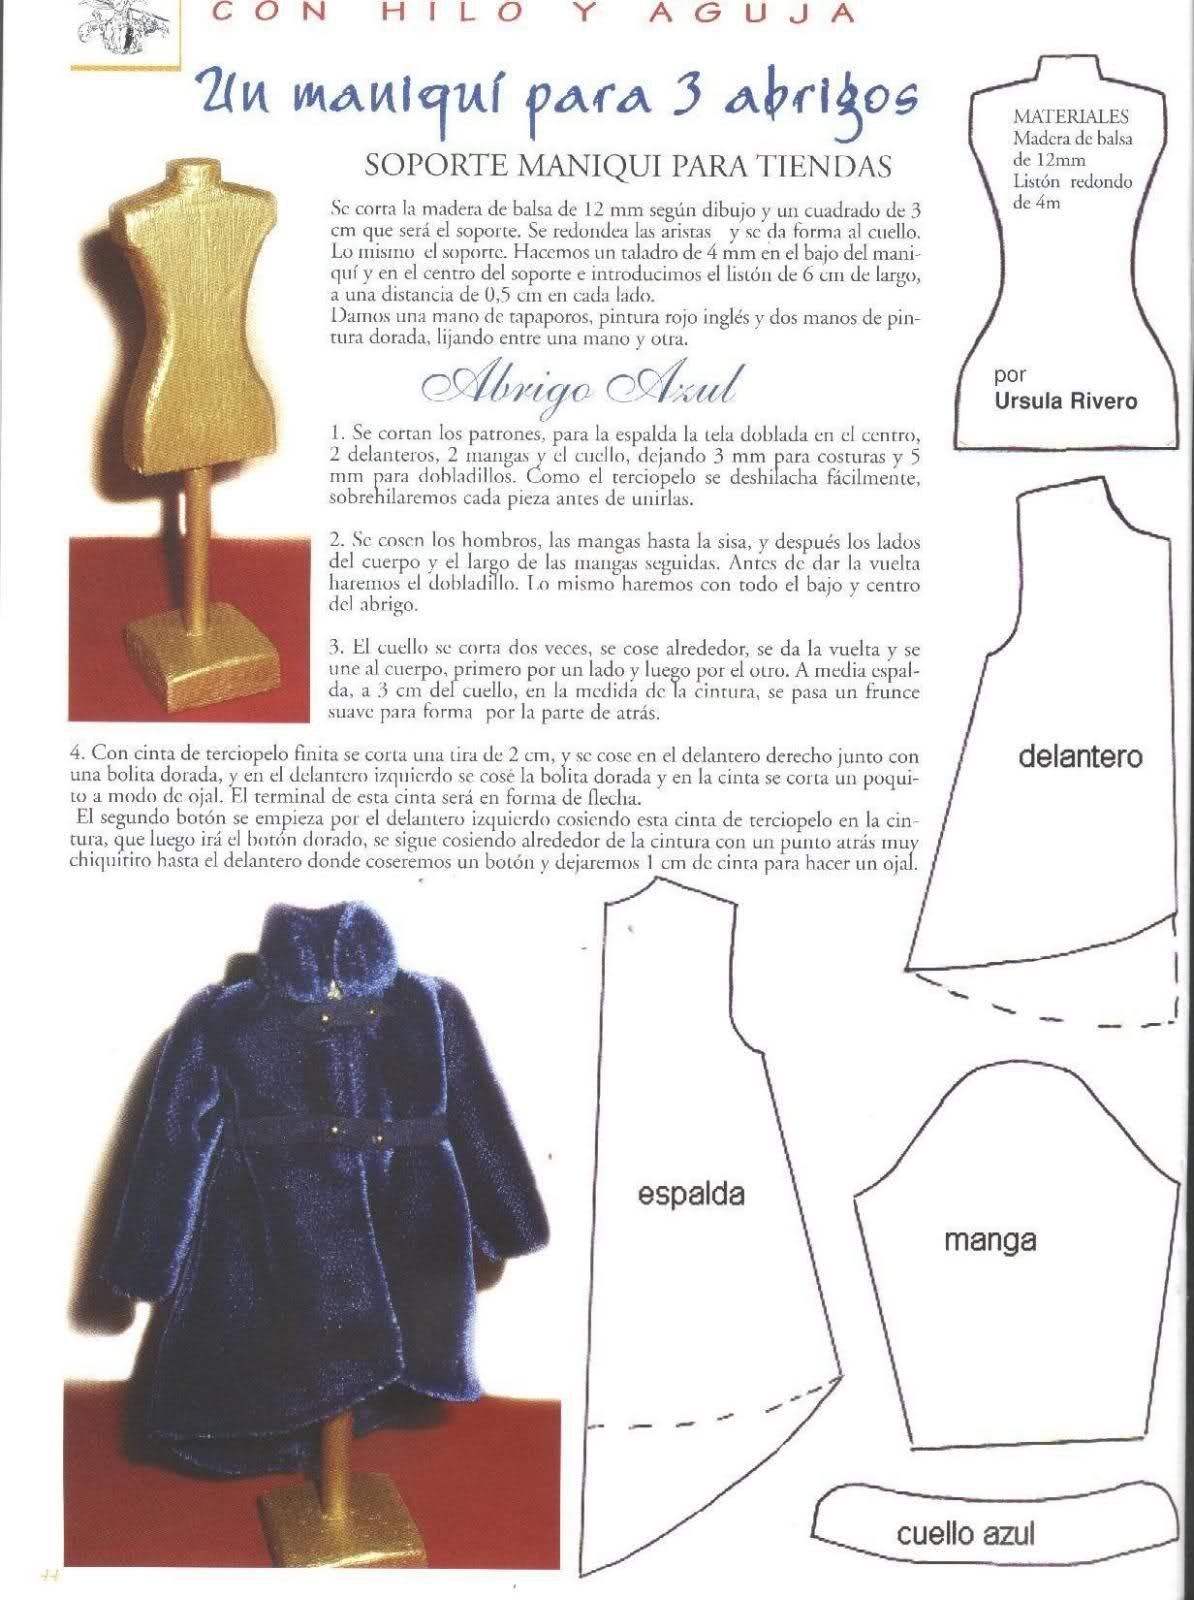 Coat pattern - Spanish   doll clothes   Pinterest   Abrigos ...